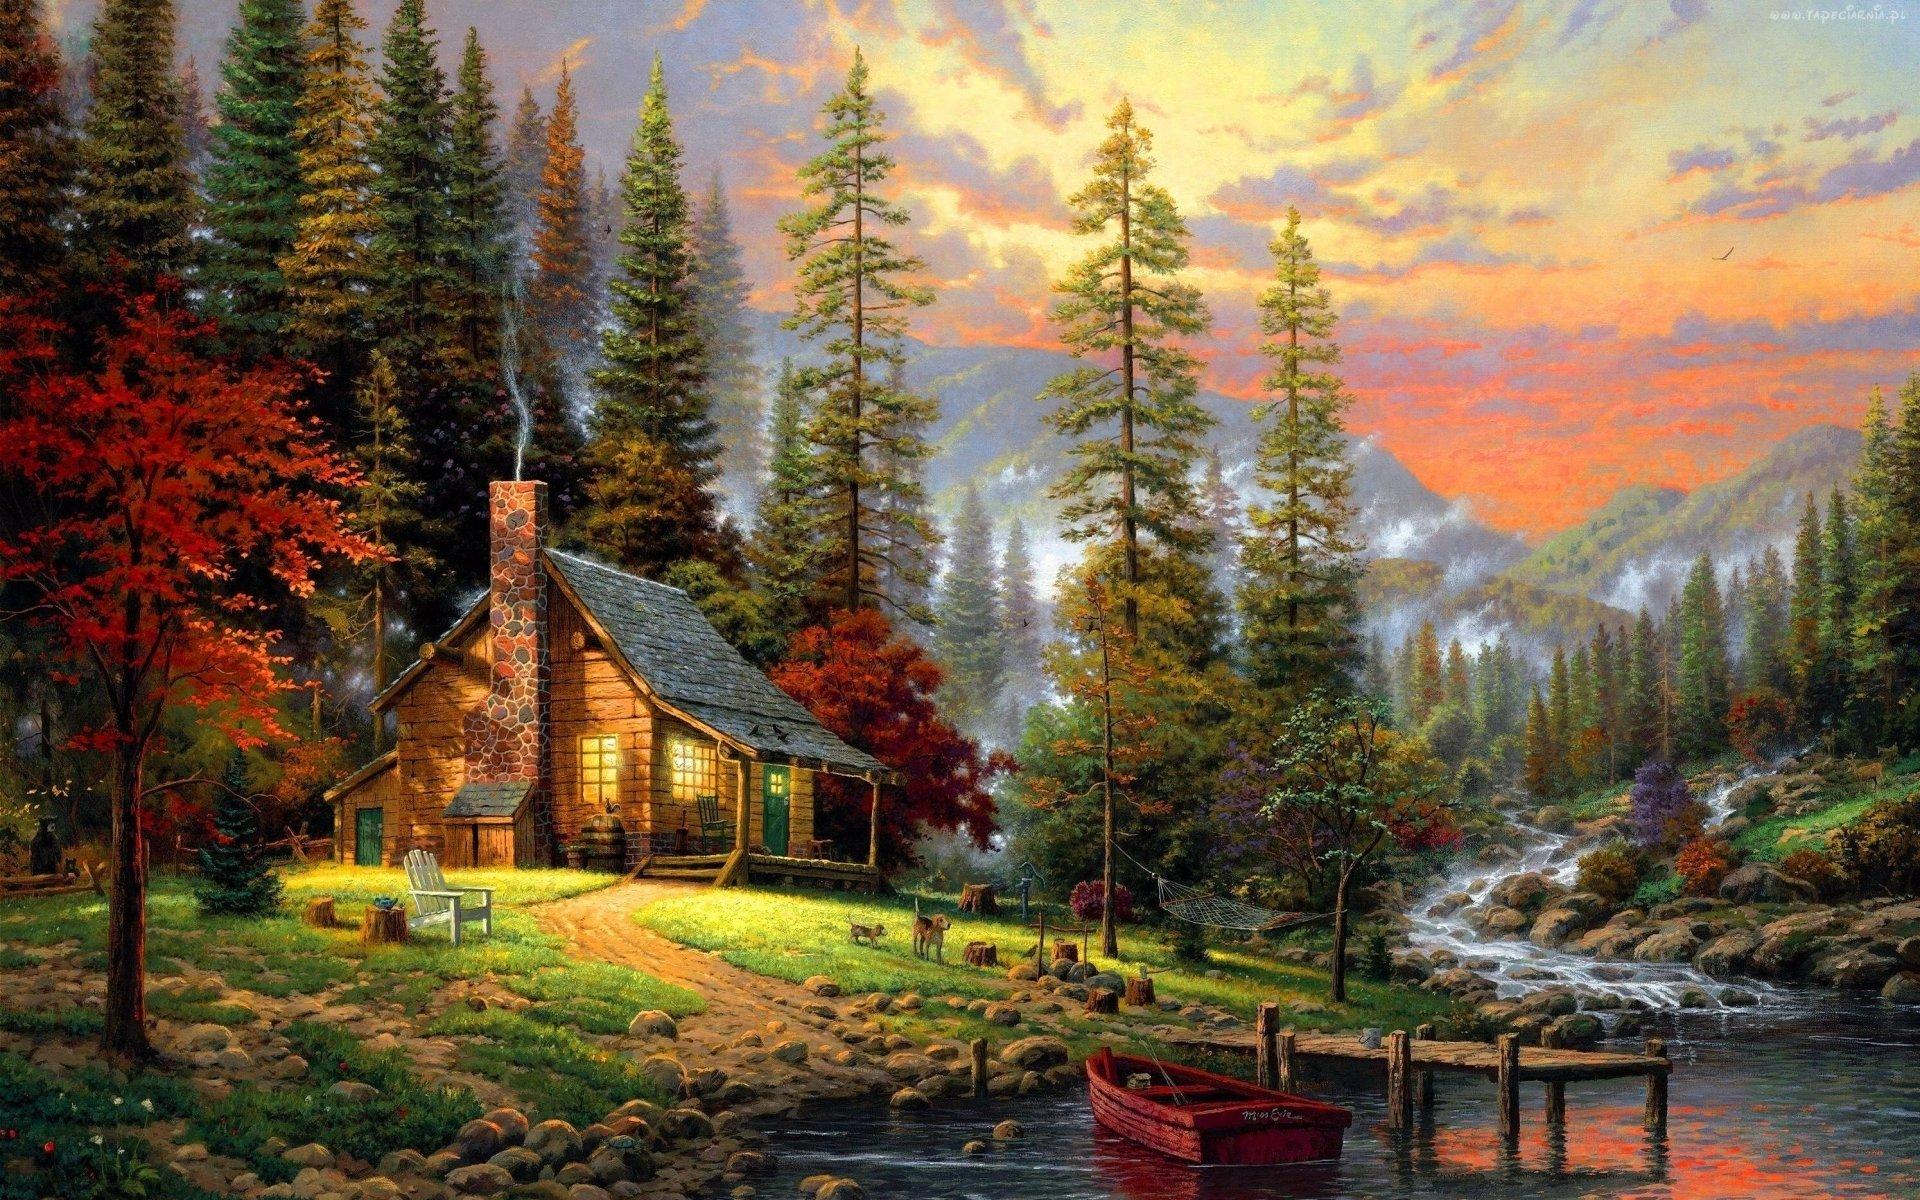 A Peaceful Retreat HD Wallpaper Background Image 1920x1200 1920x1200